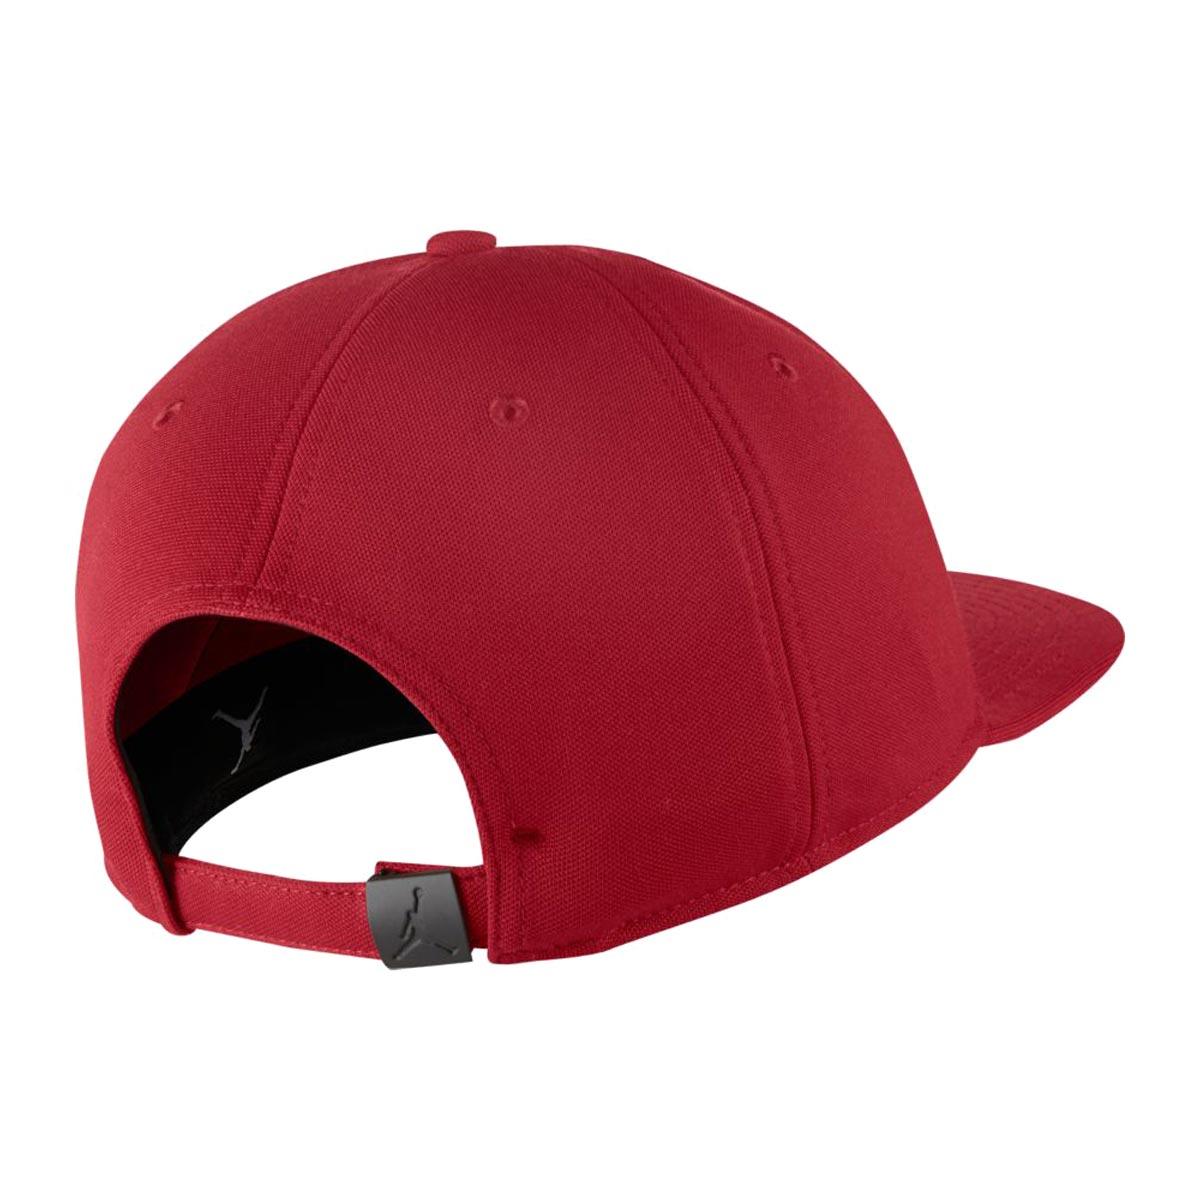 76f14d40d82 NIKE JORDAN WINGS STRAPBACK (Jordan WINGS strap back cap) GYM RED BLACK  17FA-I